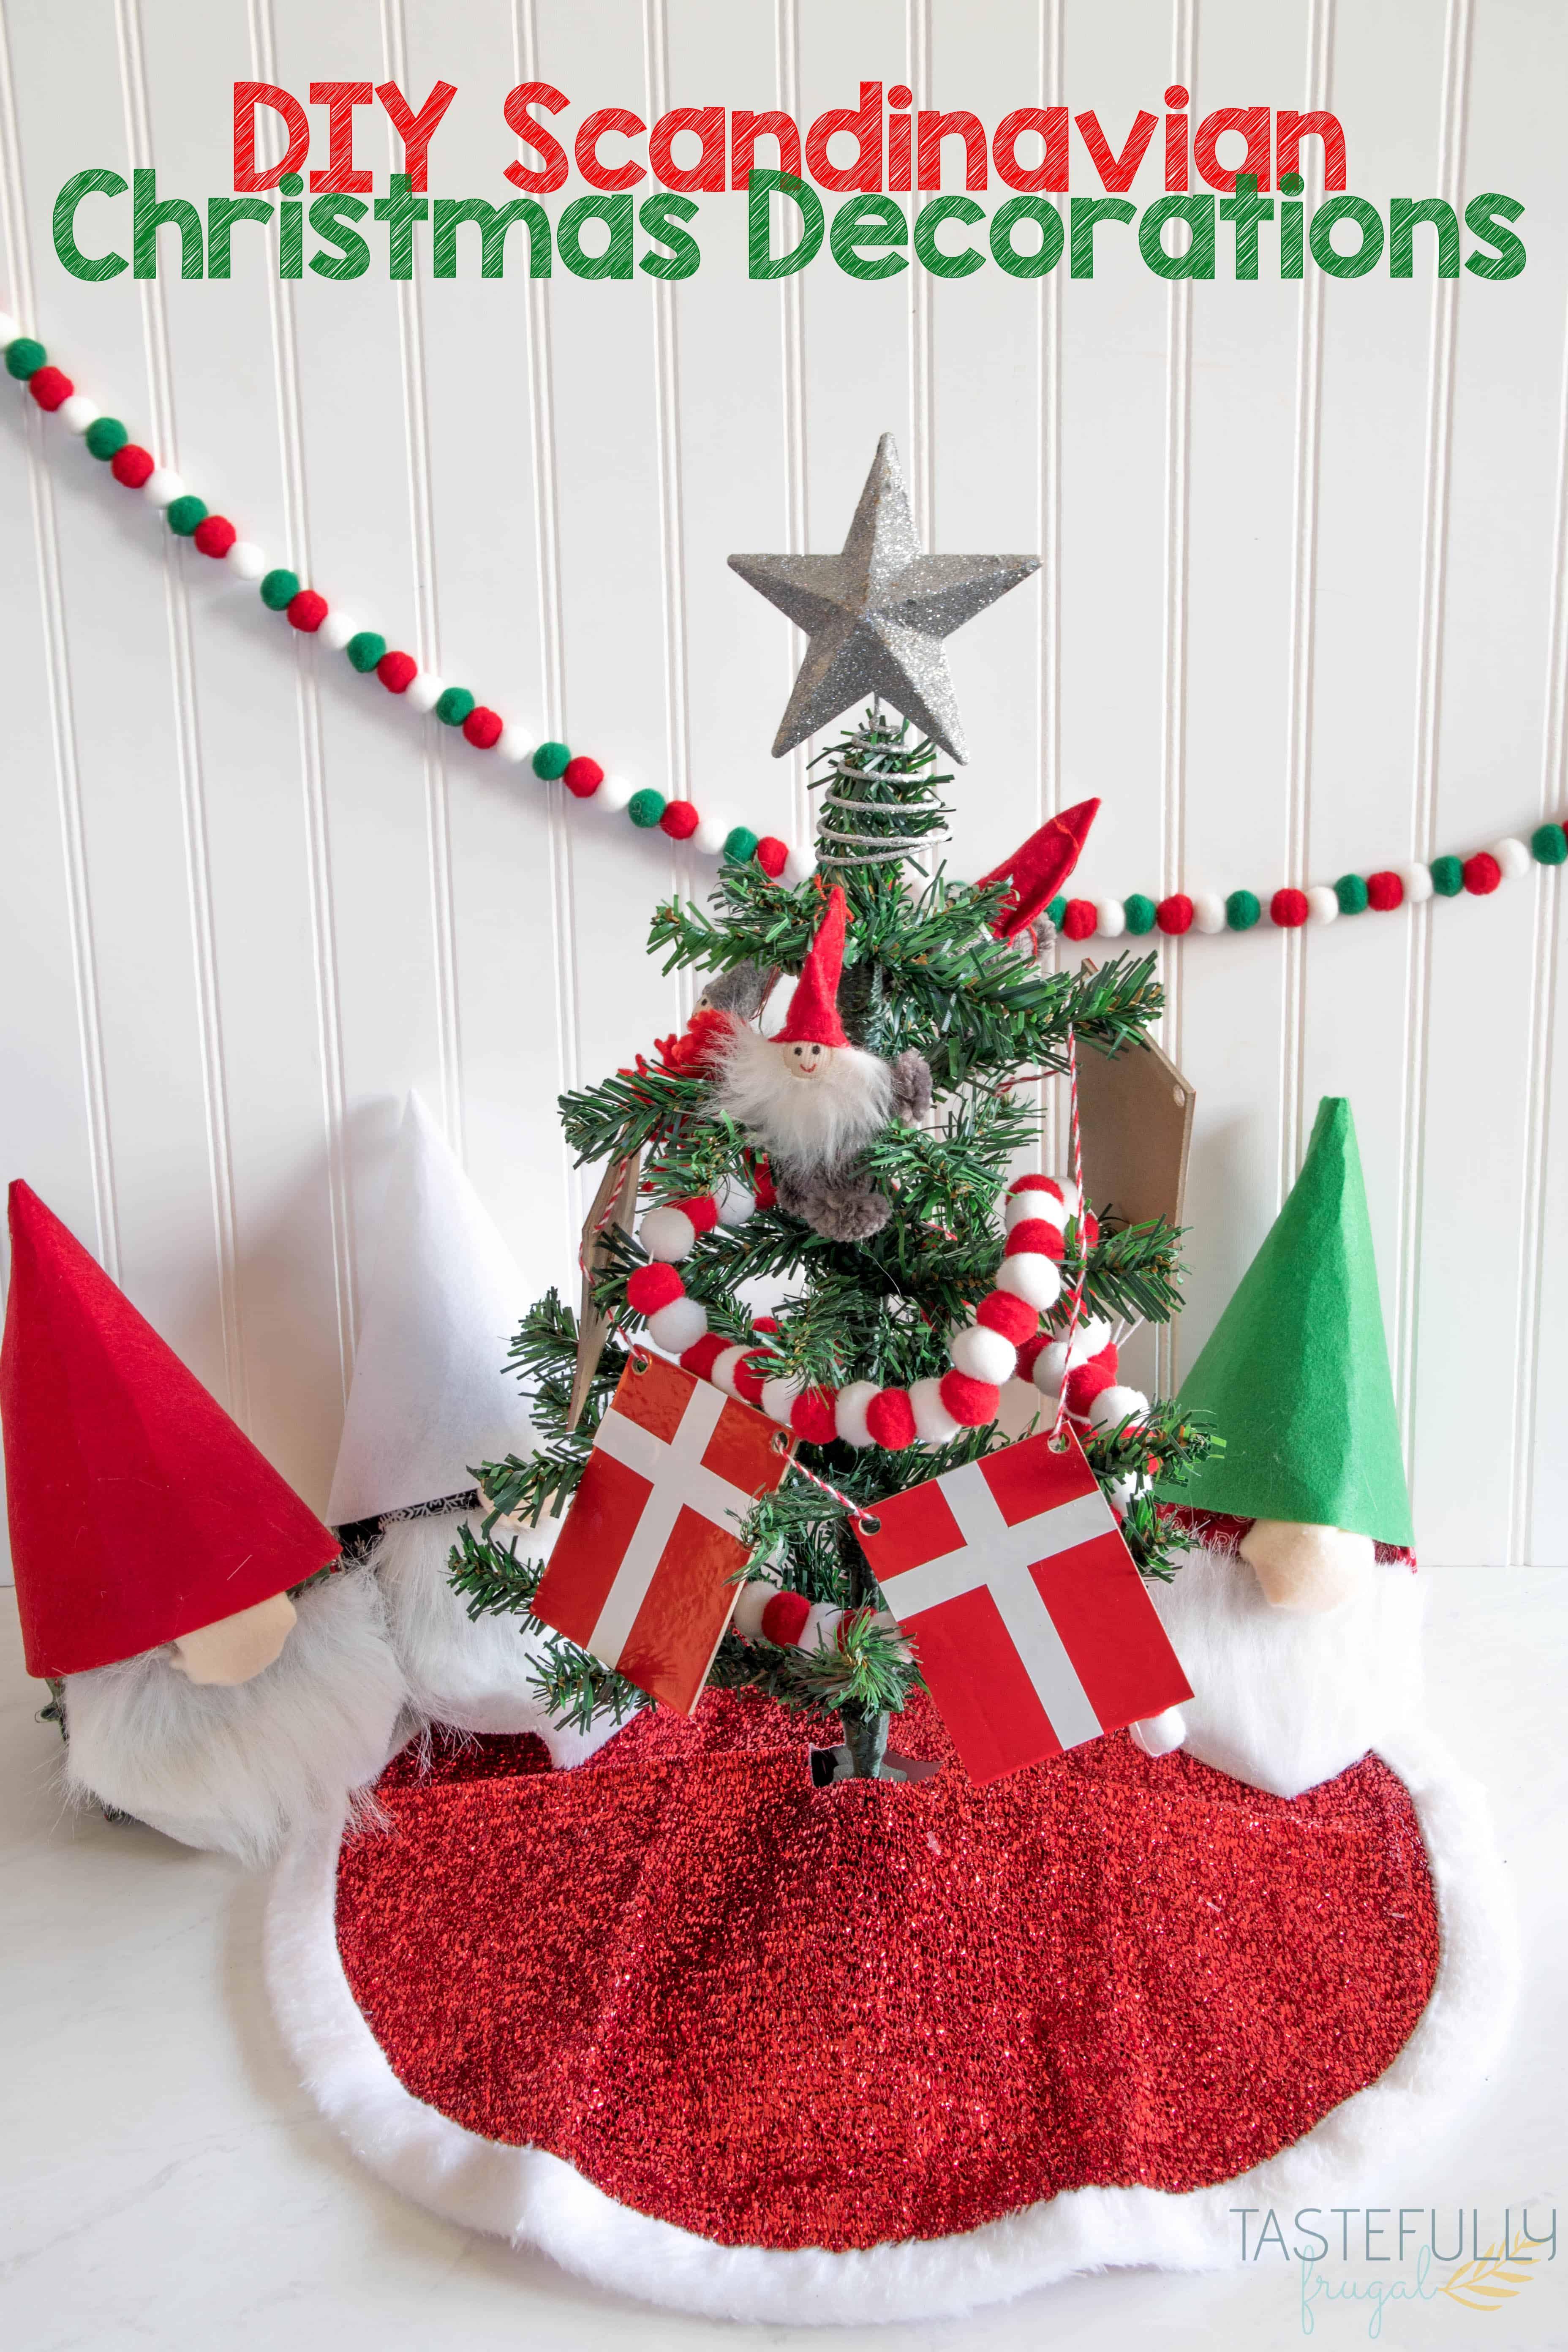 Scandinavian Christmas Decor Diy.Diy Scandinavian Christmas Decorations Tastefully Frugal